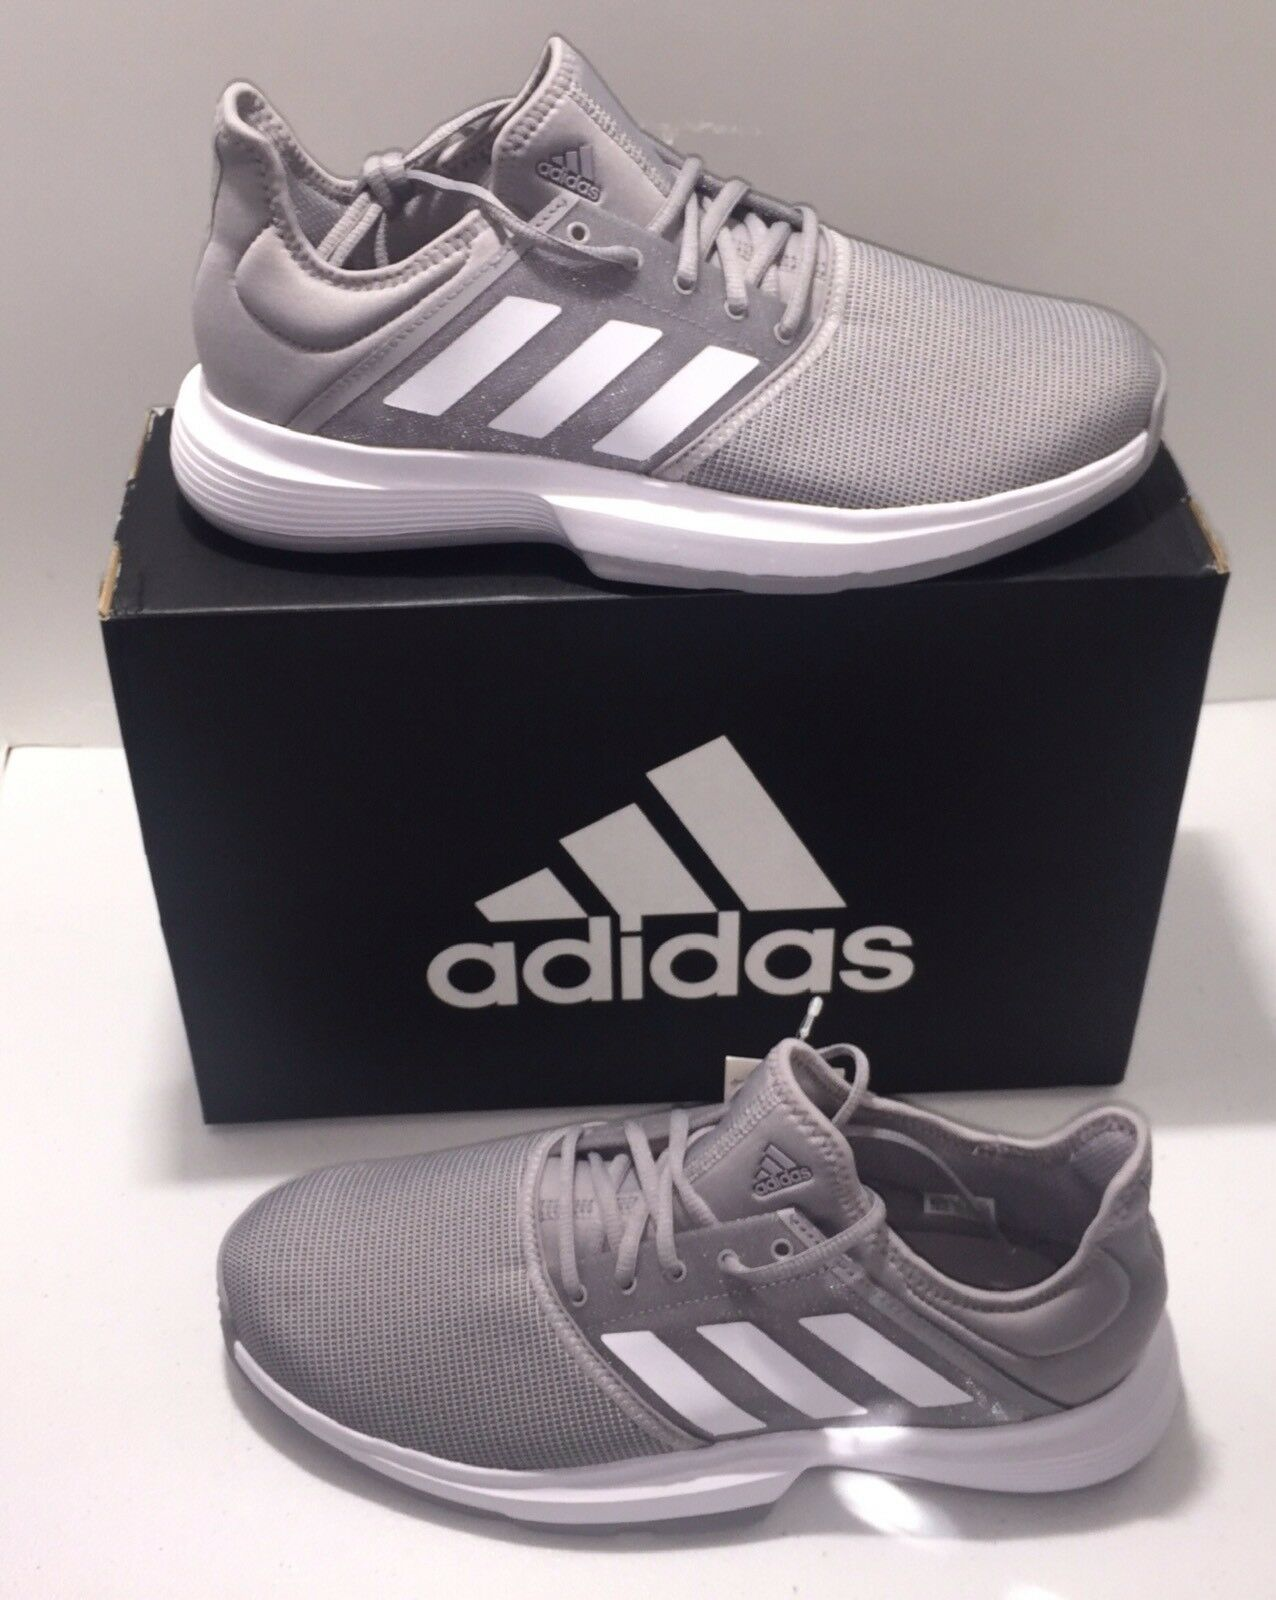 Womens Adidas Game Court Tennis shoes Sz 6